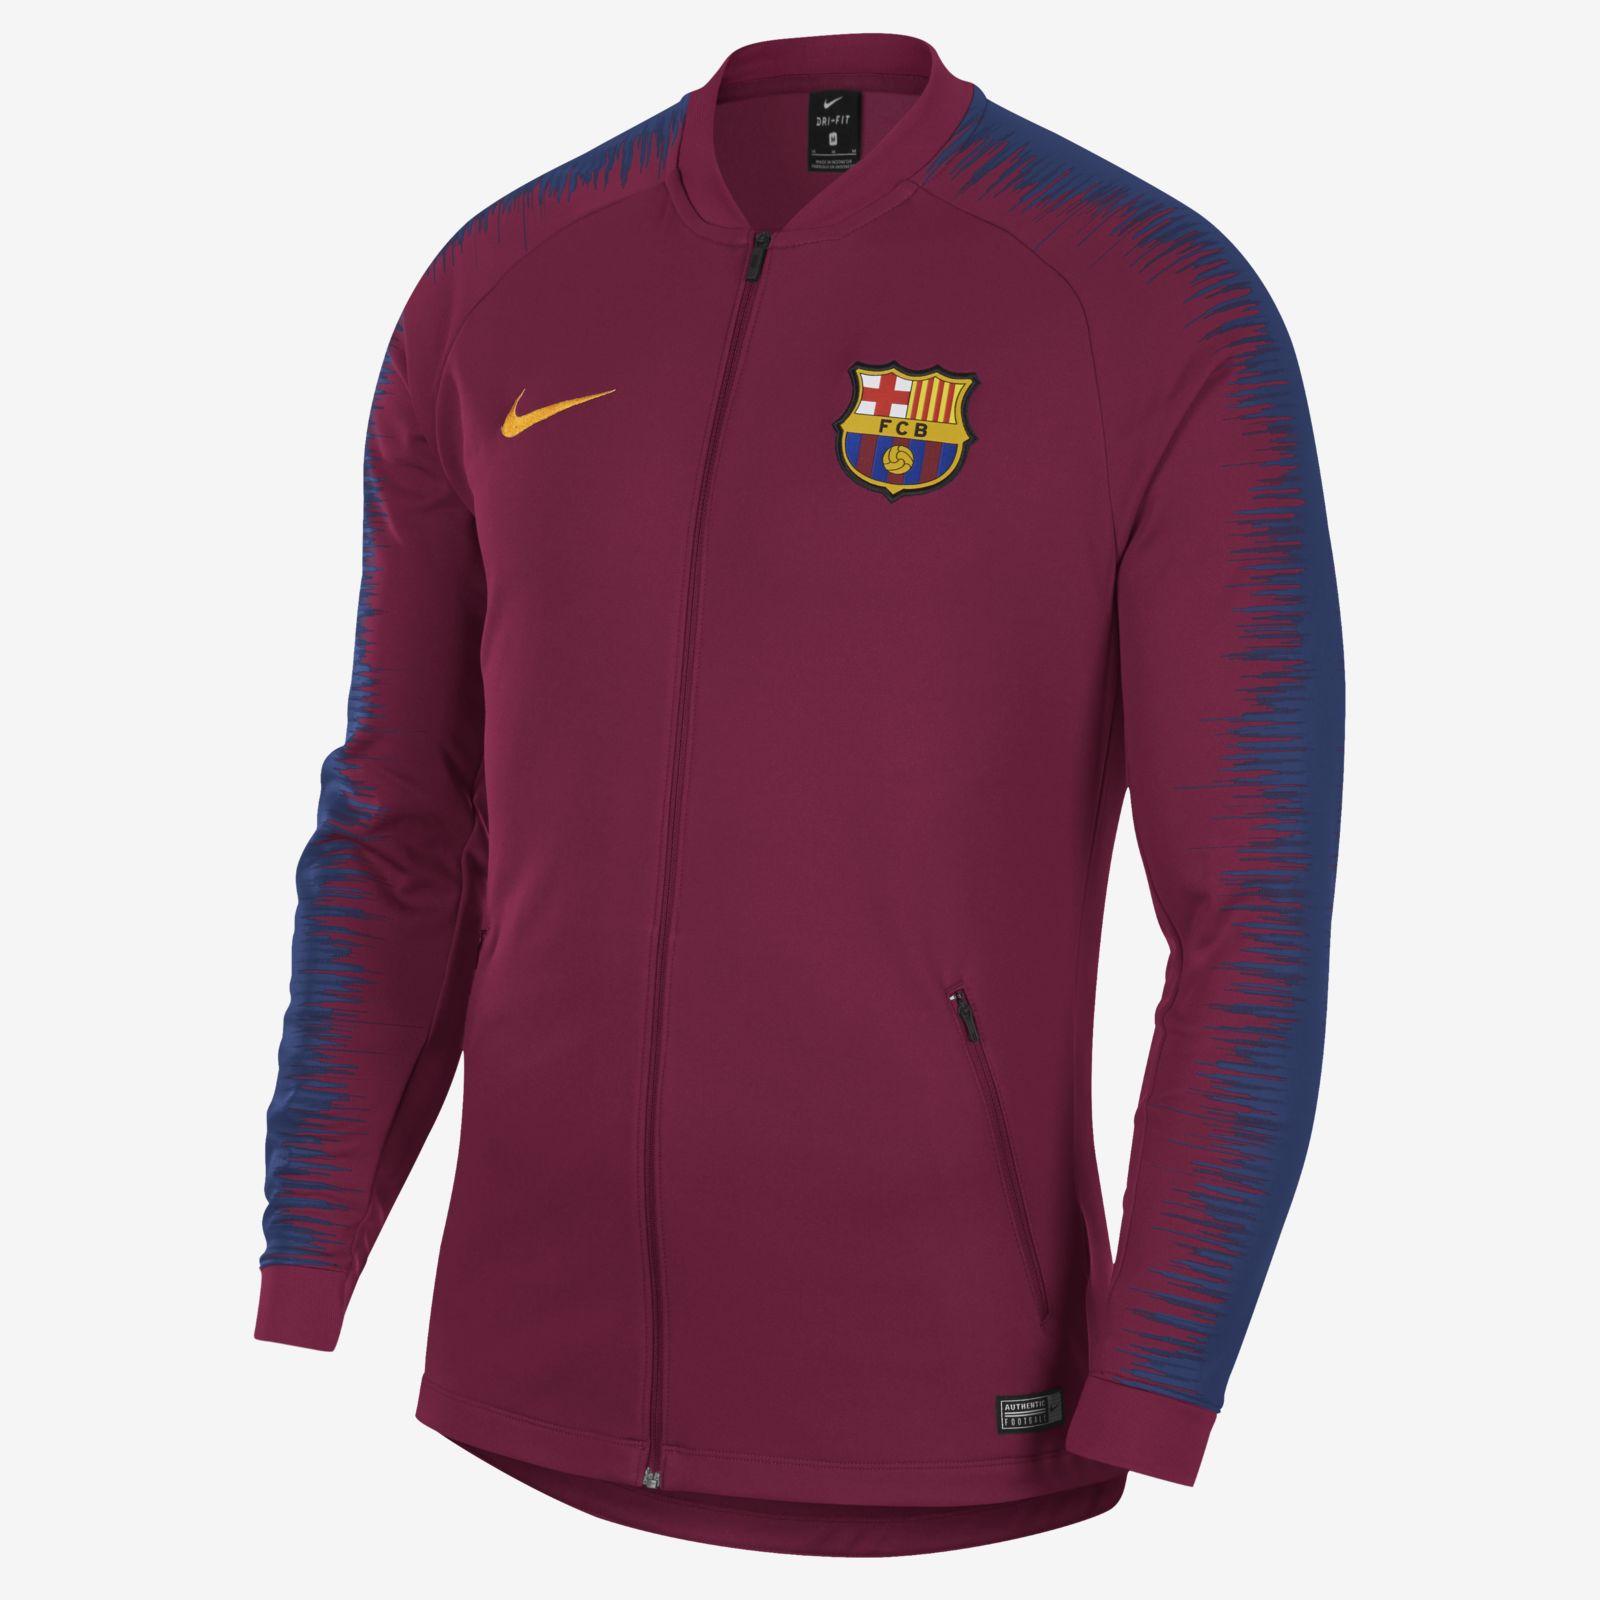 c0f79431fbe Nike FC Barcelona 2018 19 Anthem Jacket - Soccer Shop Barcelona FC  Merchandise - Superfanas.lt